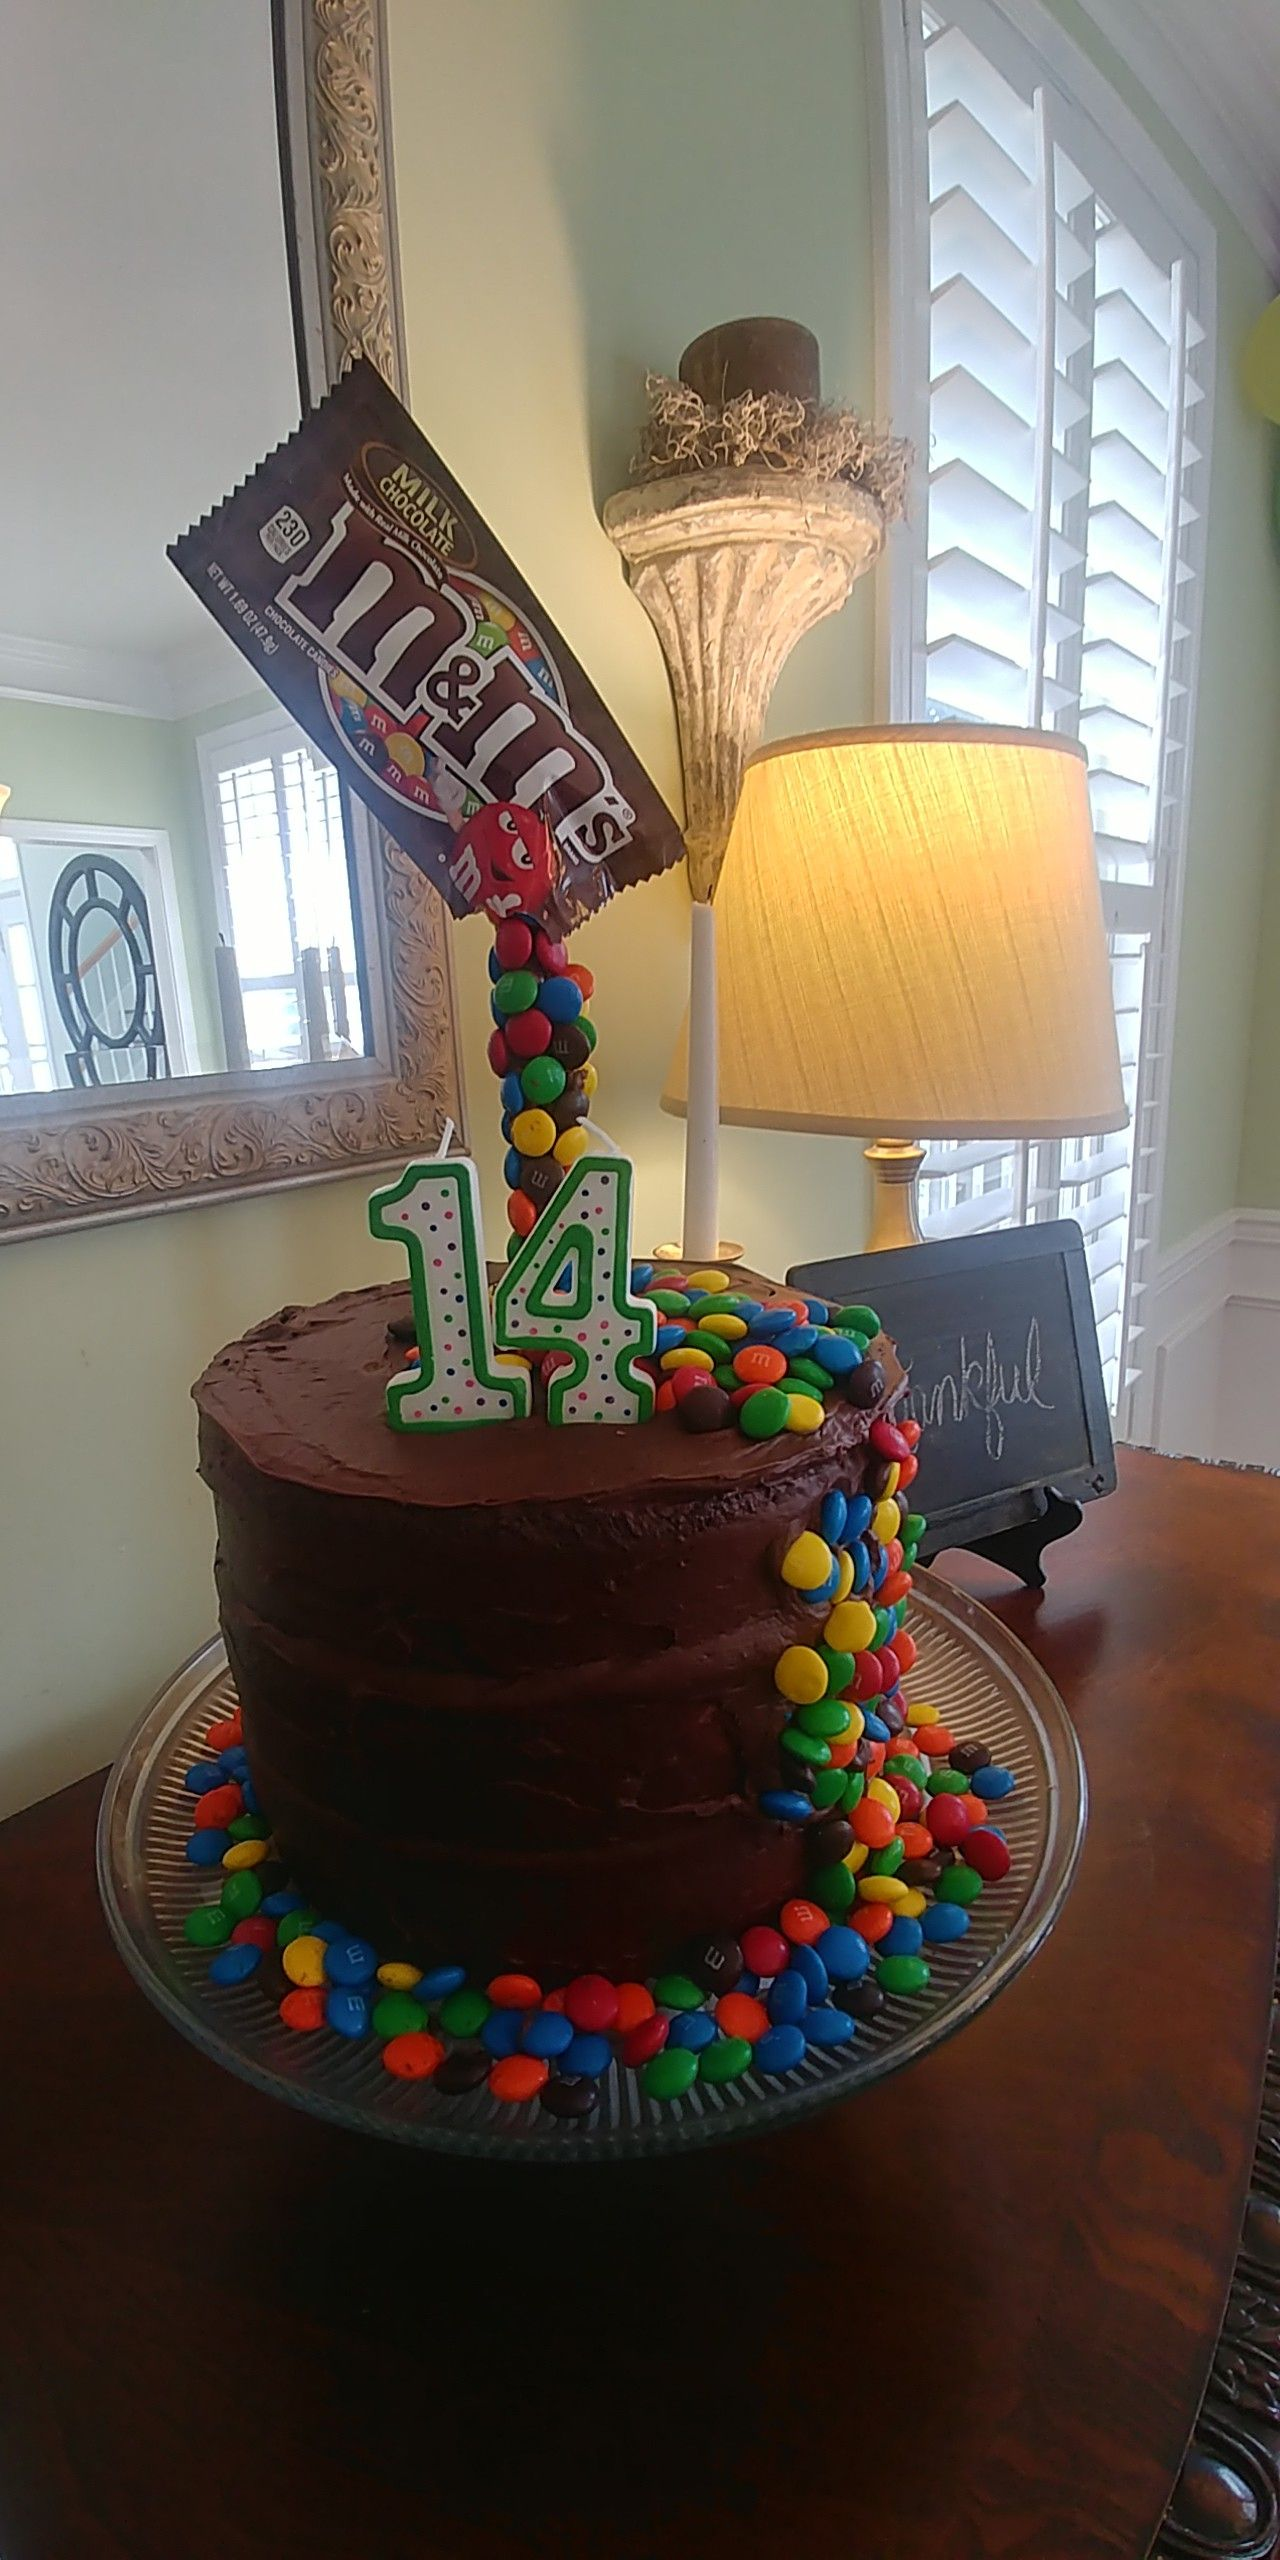 Peachy Bens 14Th Birthday Cake Mnms Candy Teenboybirthday 14Th Personalised Birthday Cards Veneteletsinfo